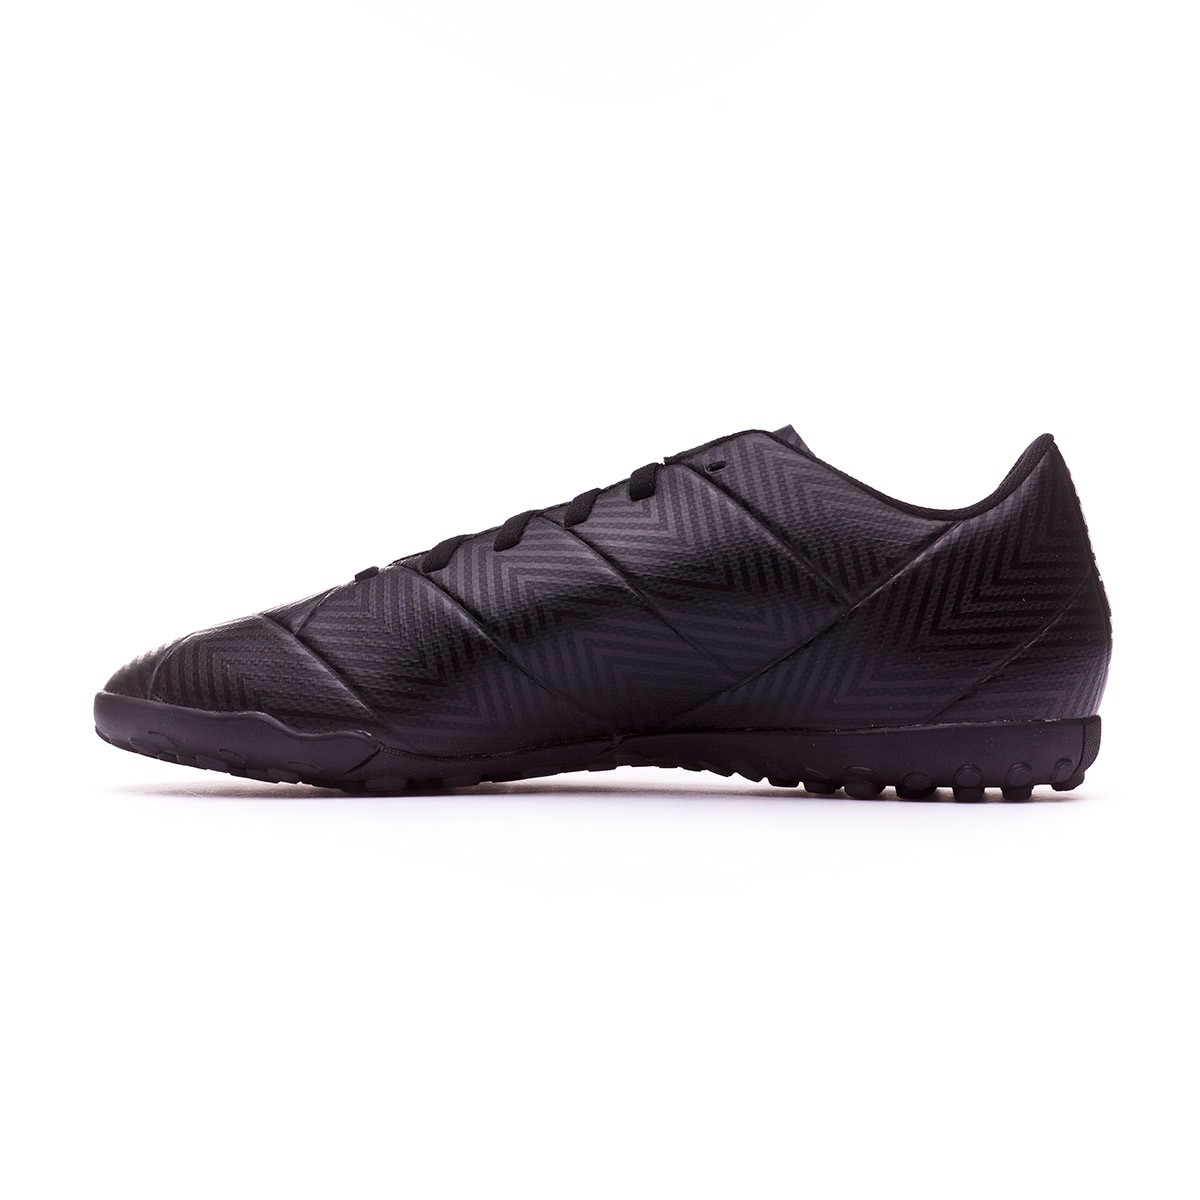 26bf27f45f3b2 Tenis adidas Nemeziz Tango 18.4 Turf Core black-White - Tienda de fútbol  Fútbol Emotion